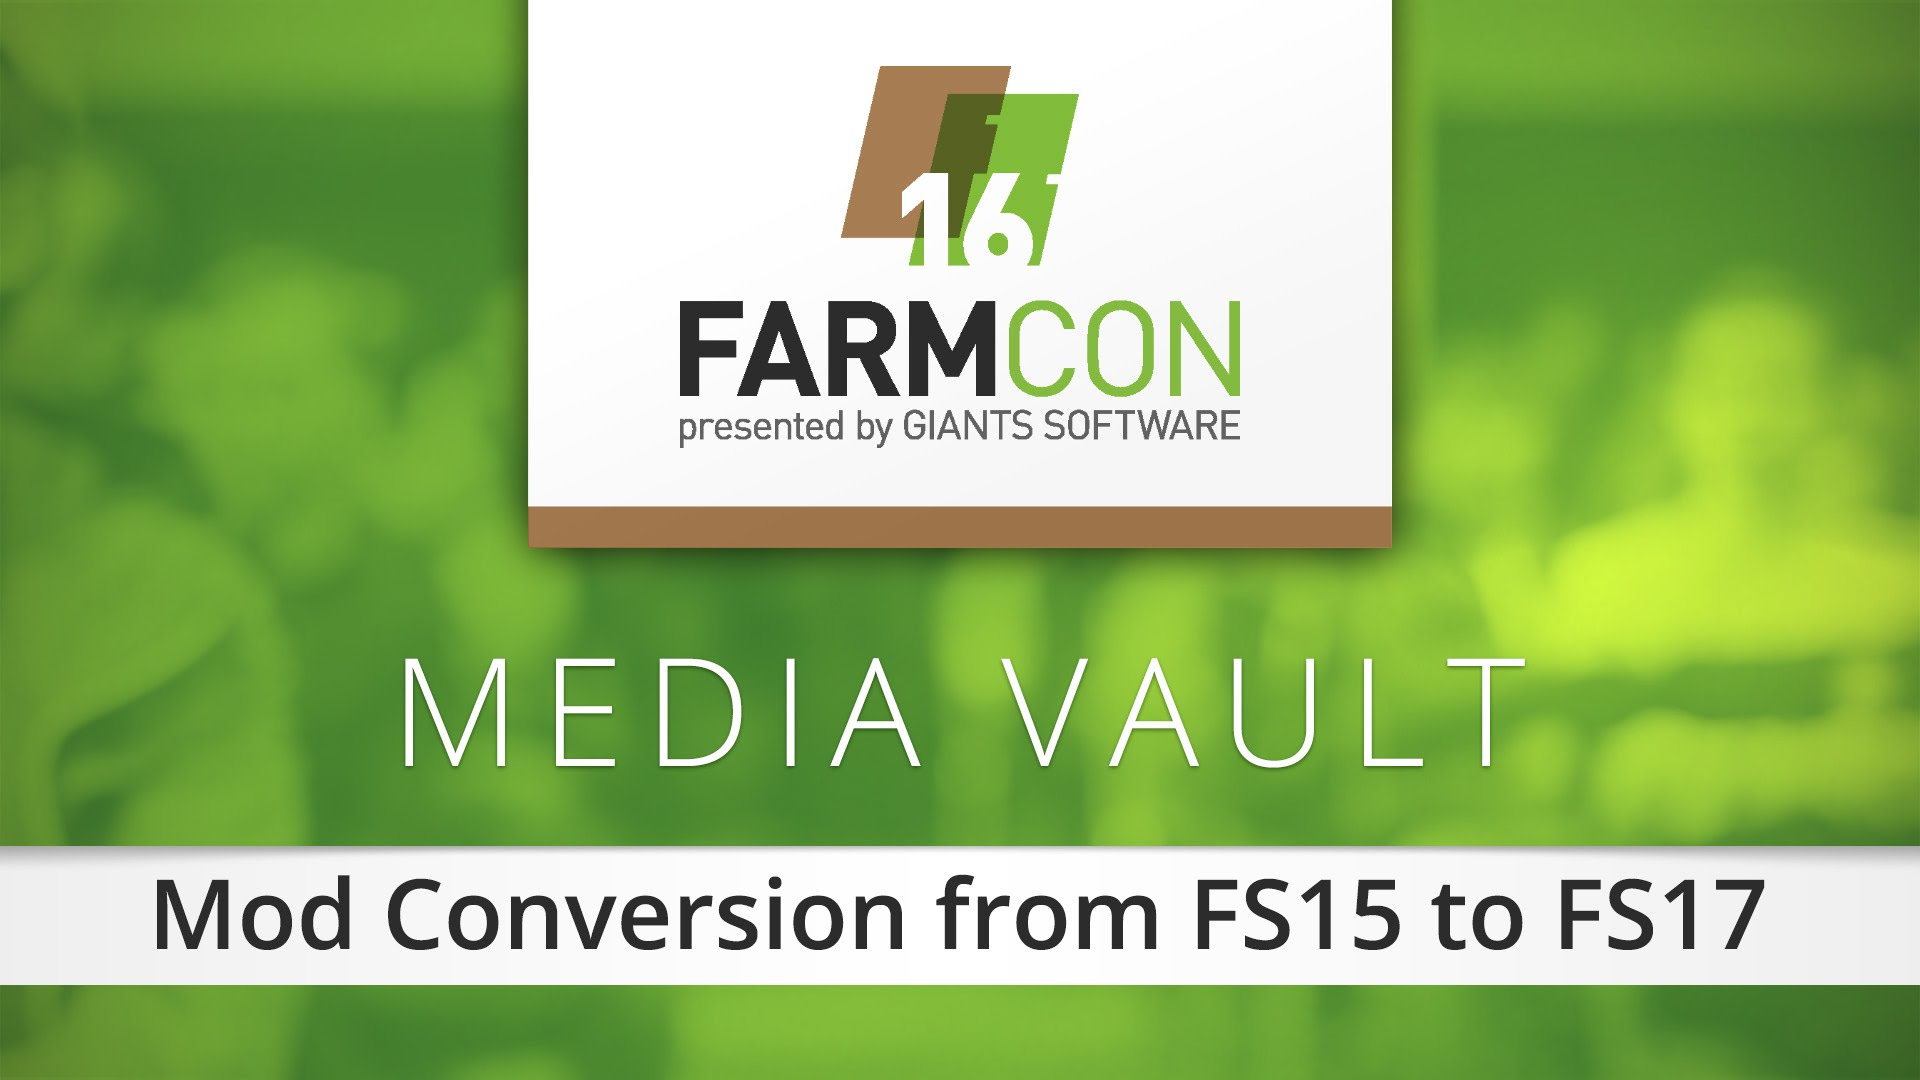 FarmCon16 - Mod Conversion from FS15 to FS17